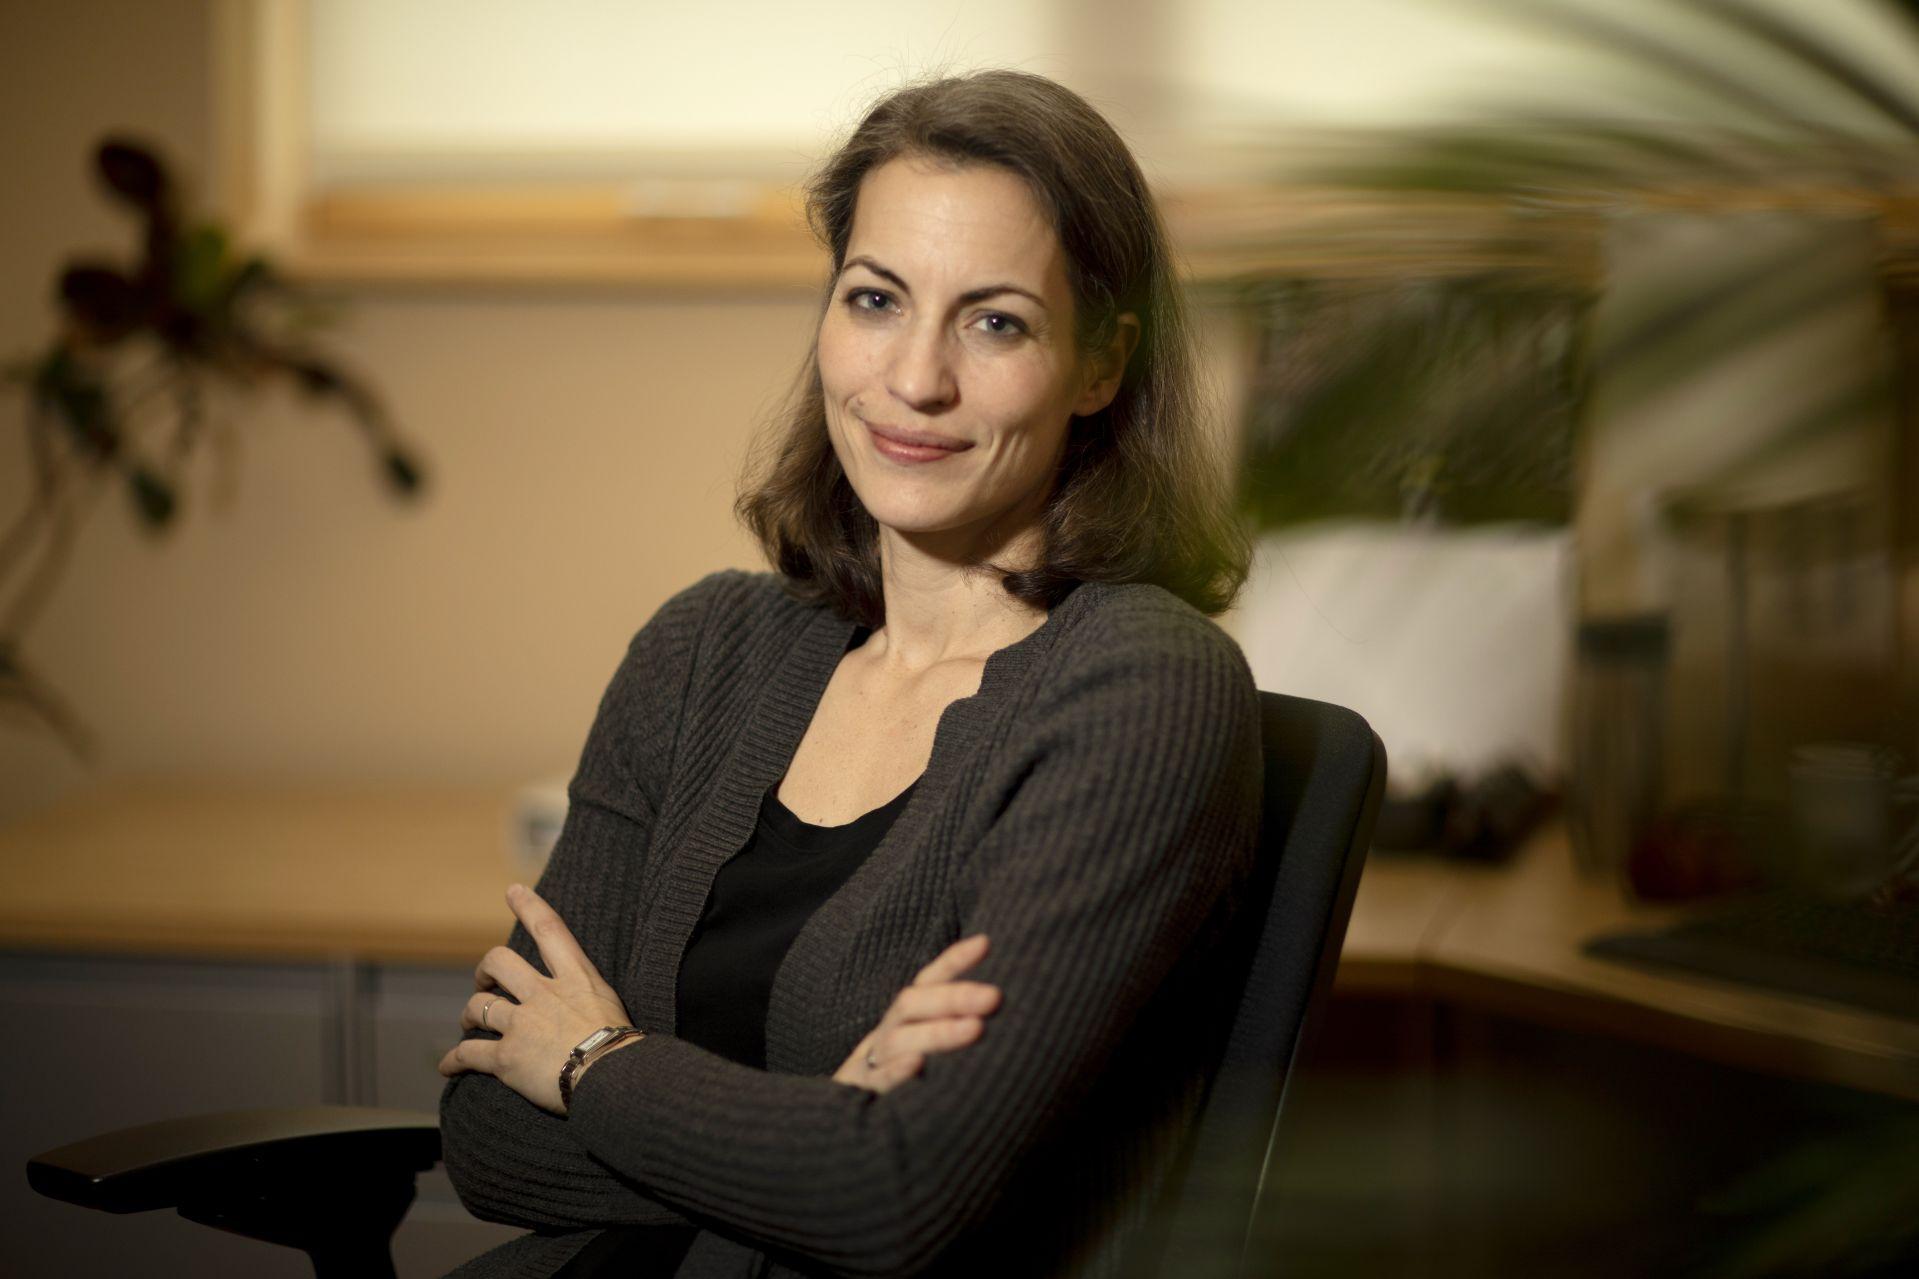 Associate Professor of Environmental Studies Sonja K. Pieck, in her office, Hedge Hall, Room 113.